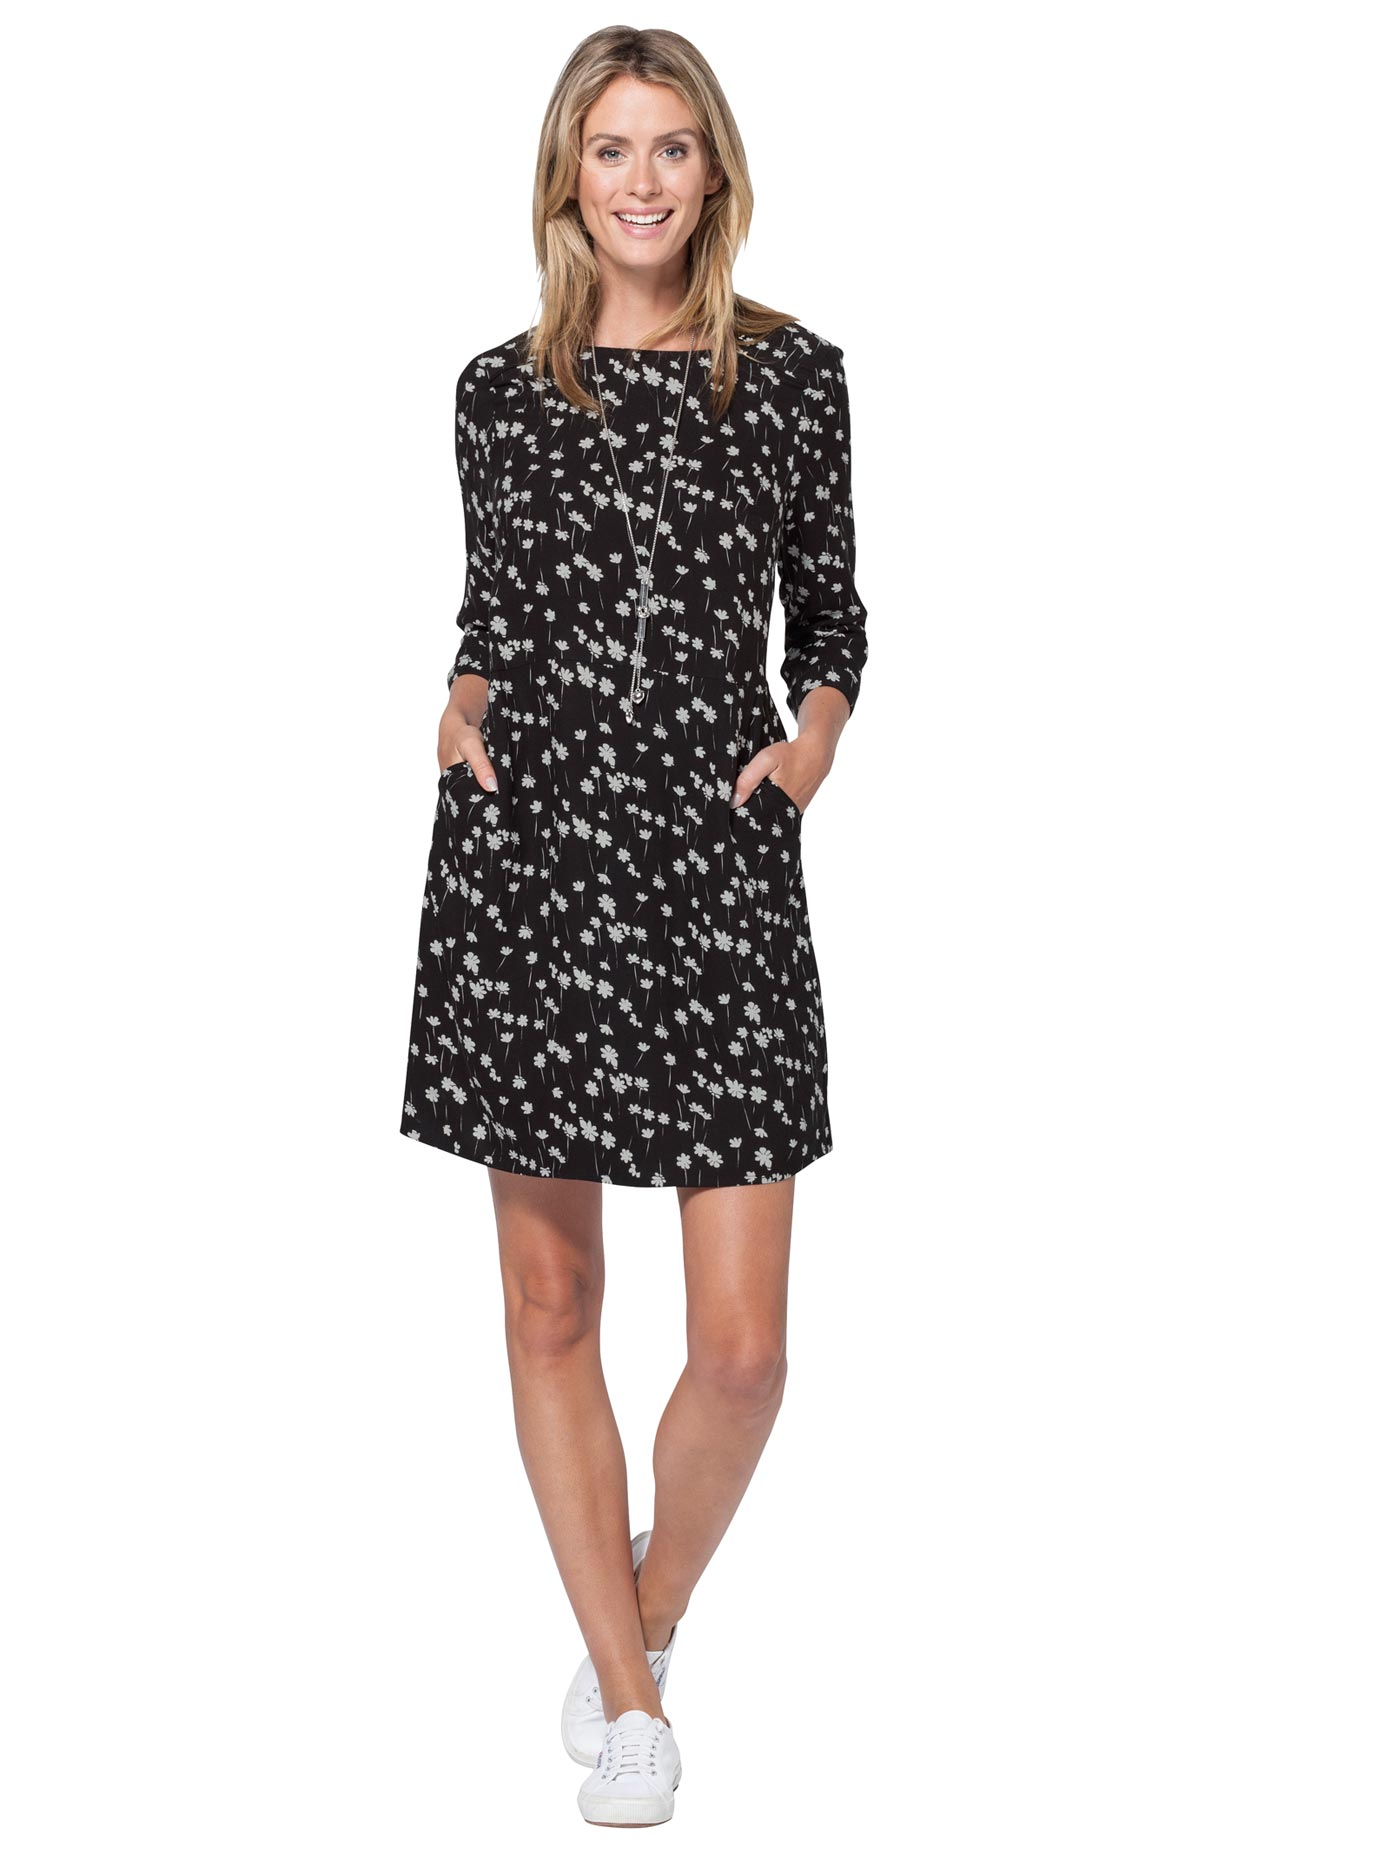 Ambria Kleid mit charmantem Druck-Dessin